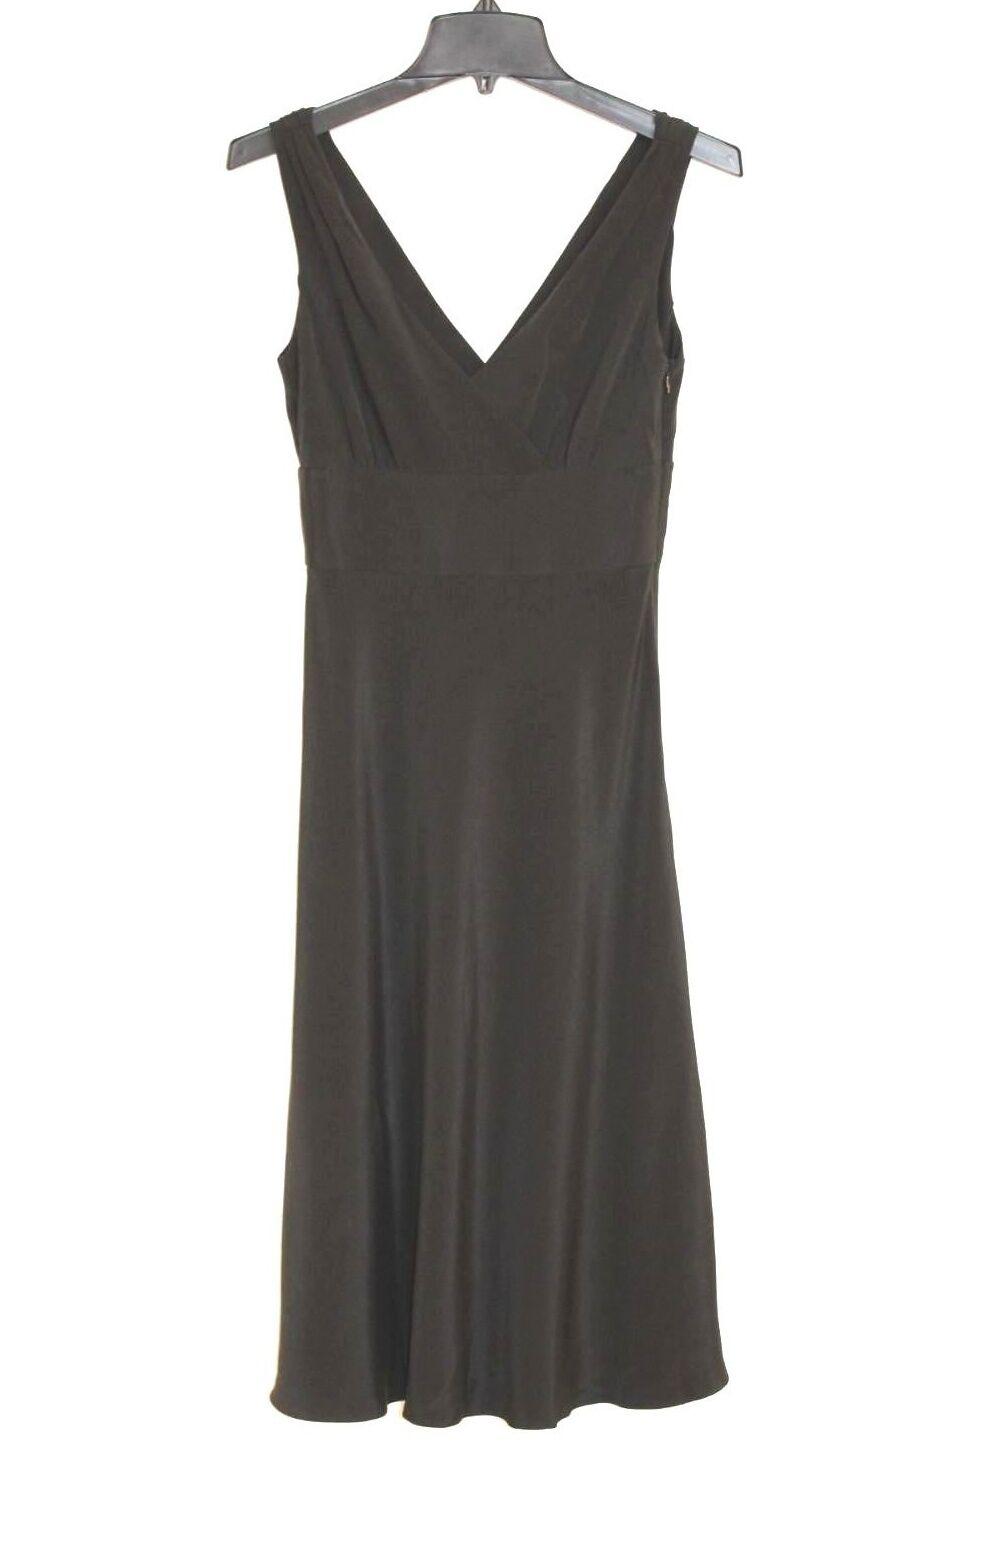 J. Crew - 0 (XS) - Solid schwarz 100% Silk - Sleeveless Empire Waist Formal Dress